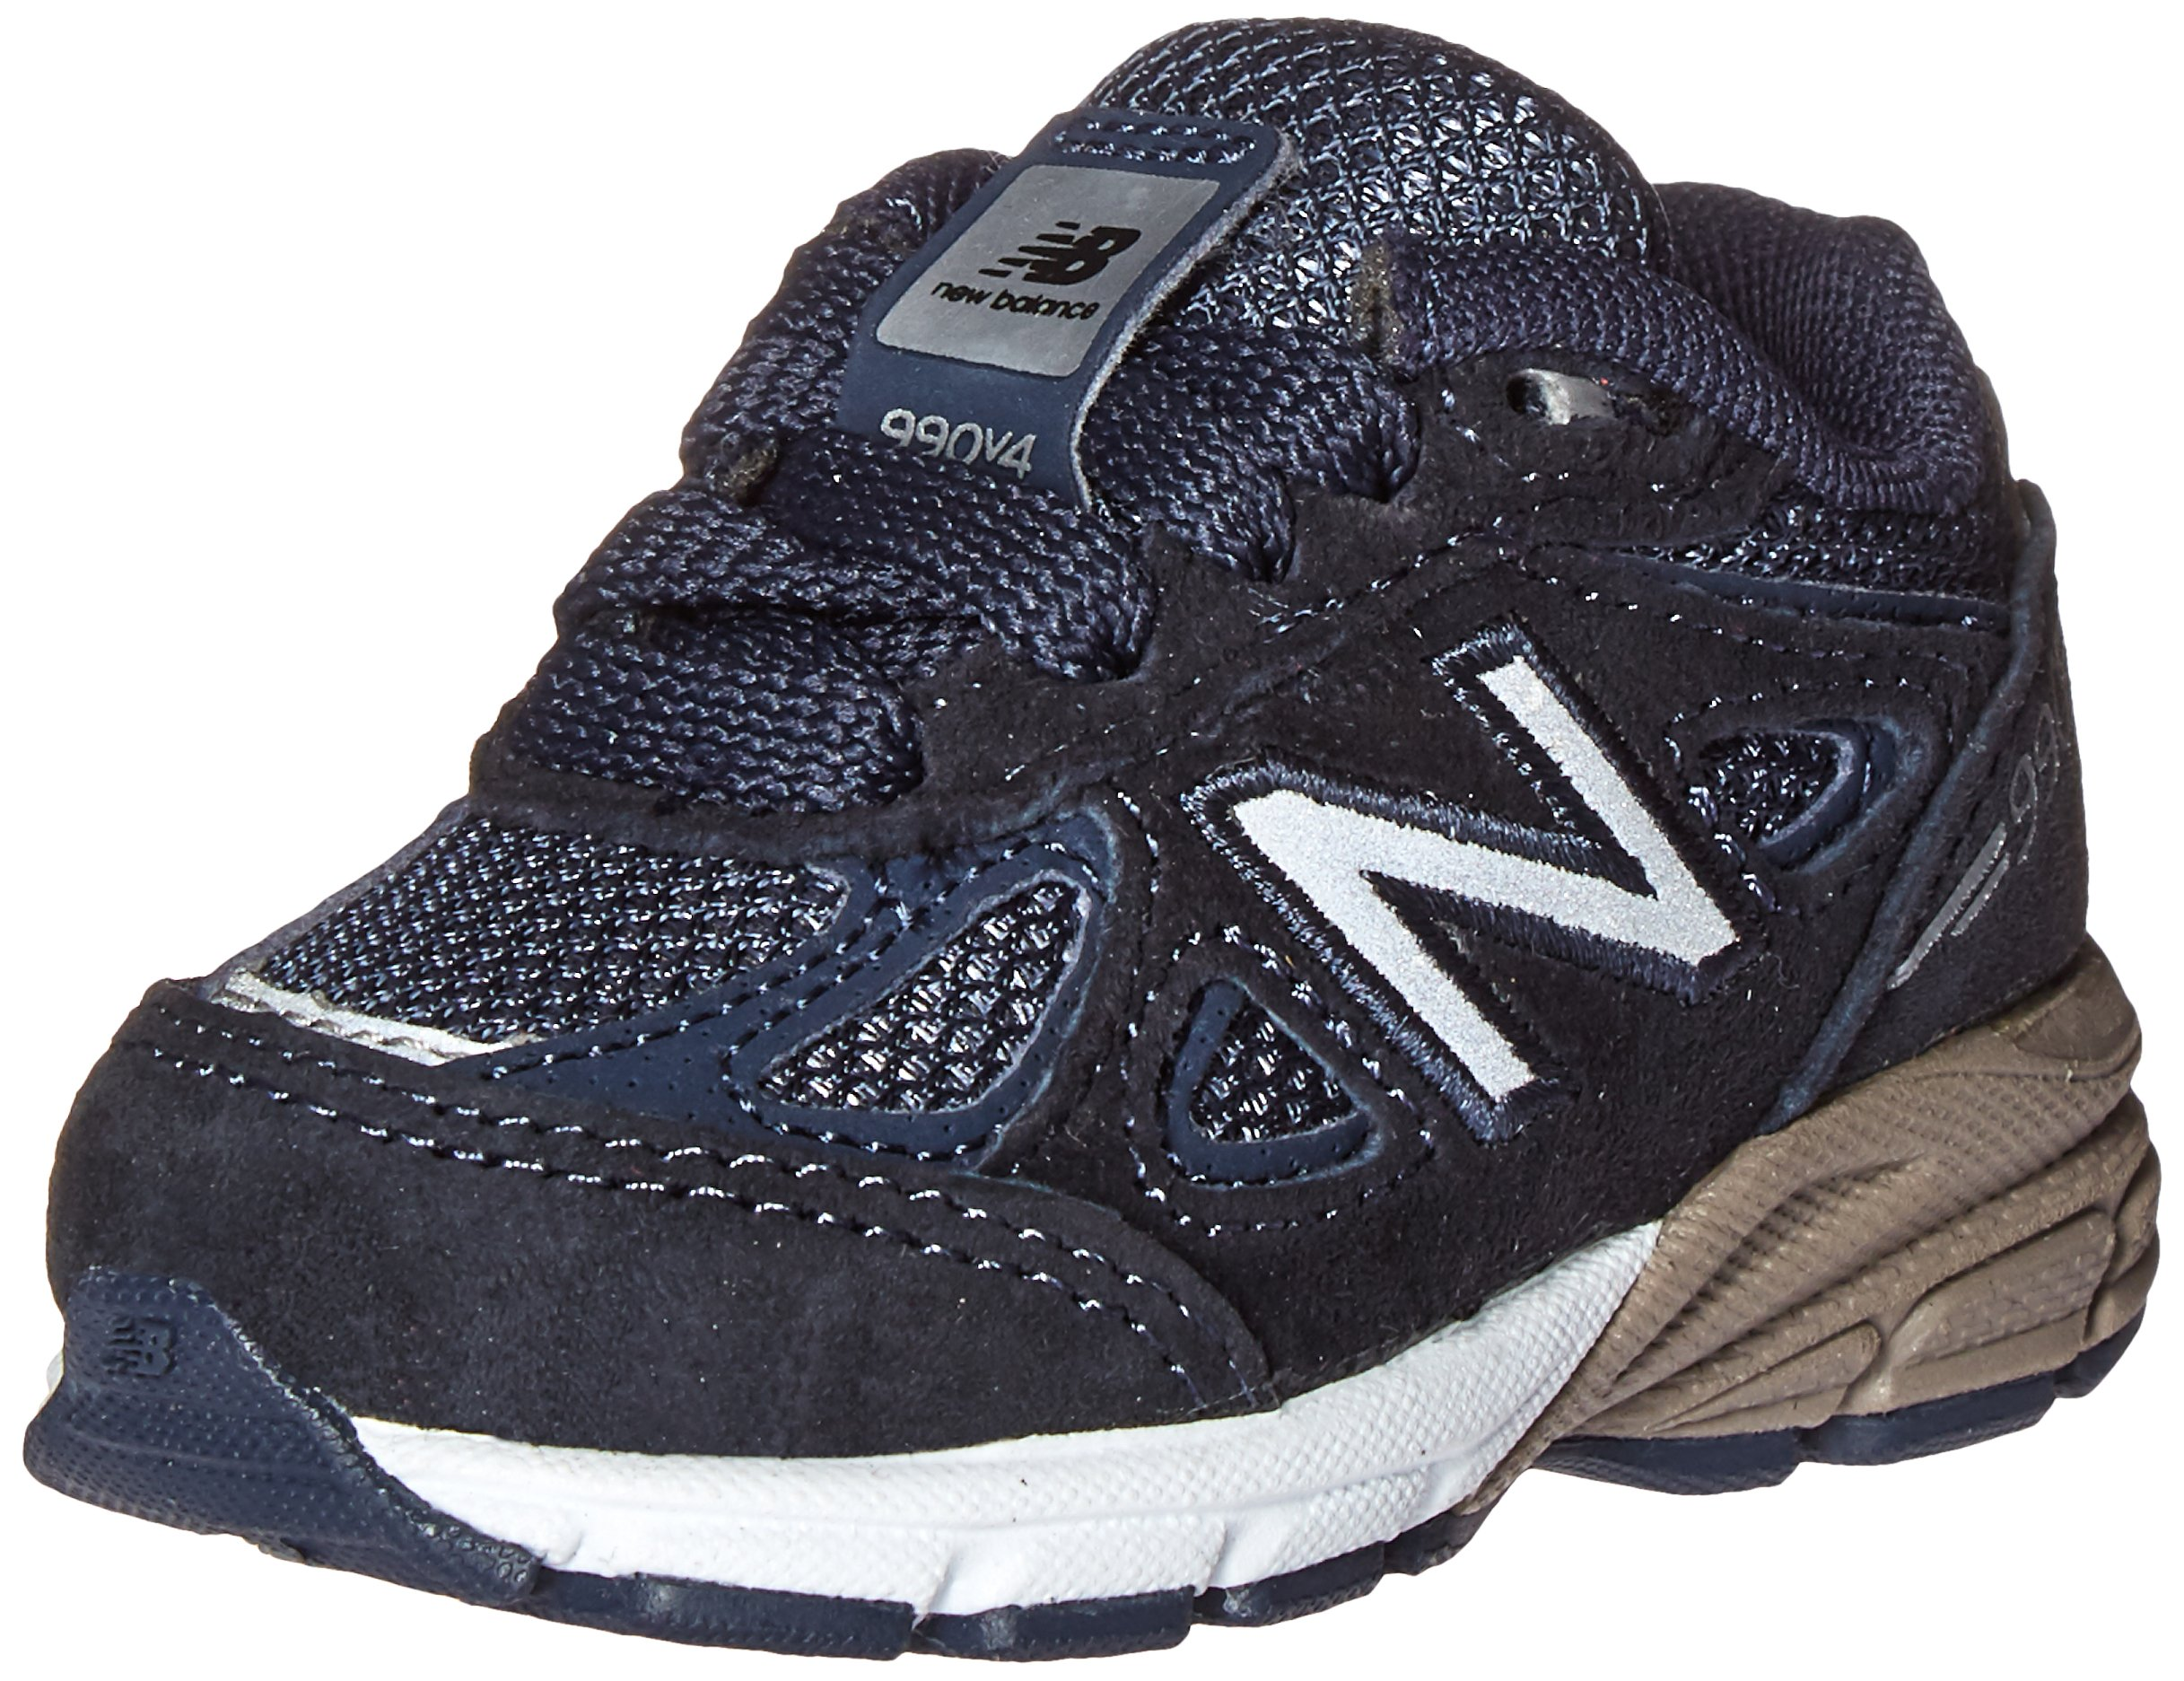 New Balance KV990 Infant Running Shoe (Infant/Toddler), Navy, 9 M US Toddler